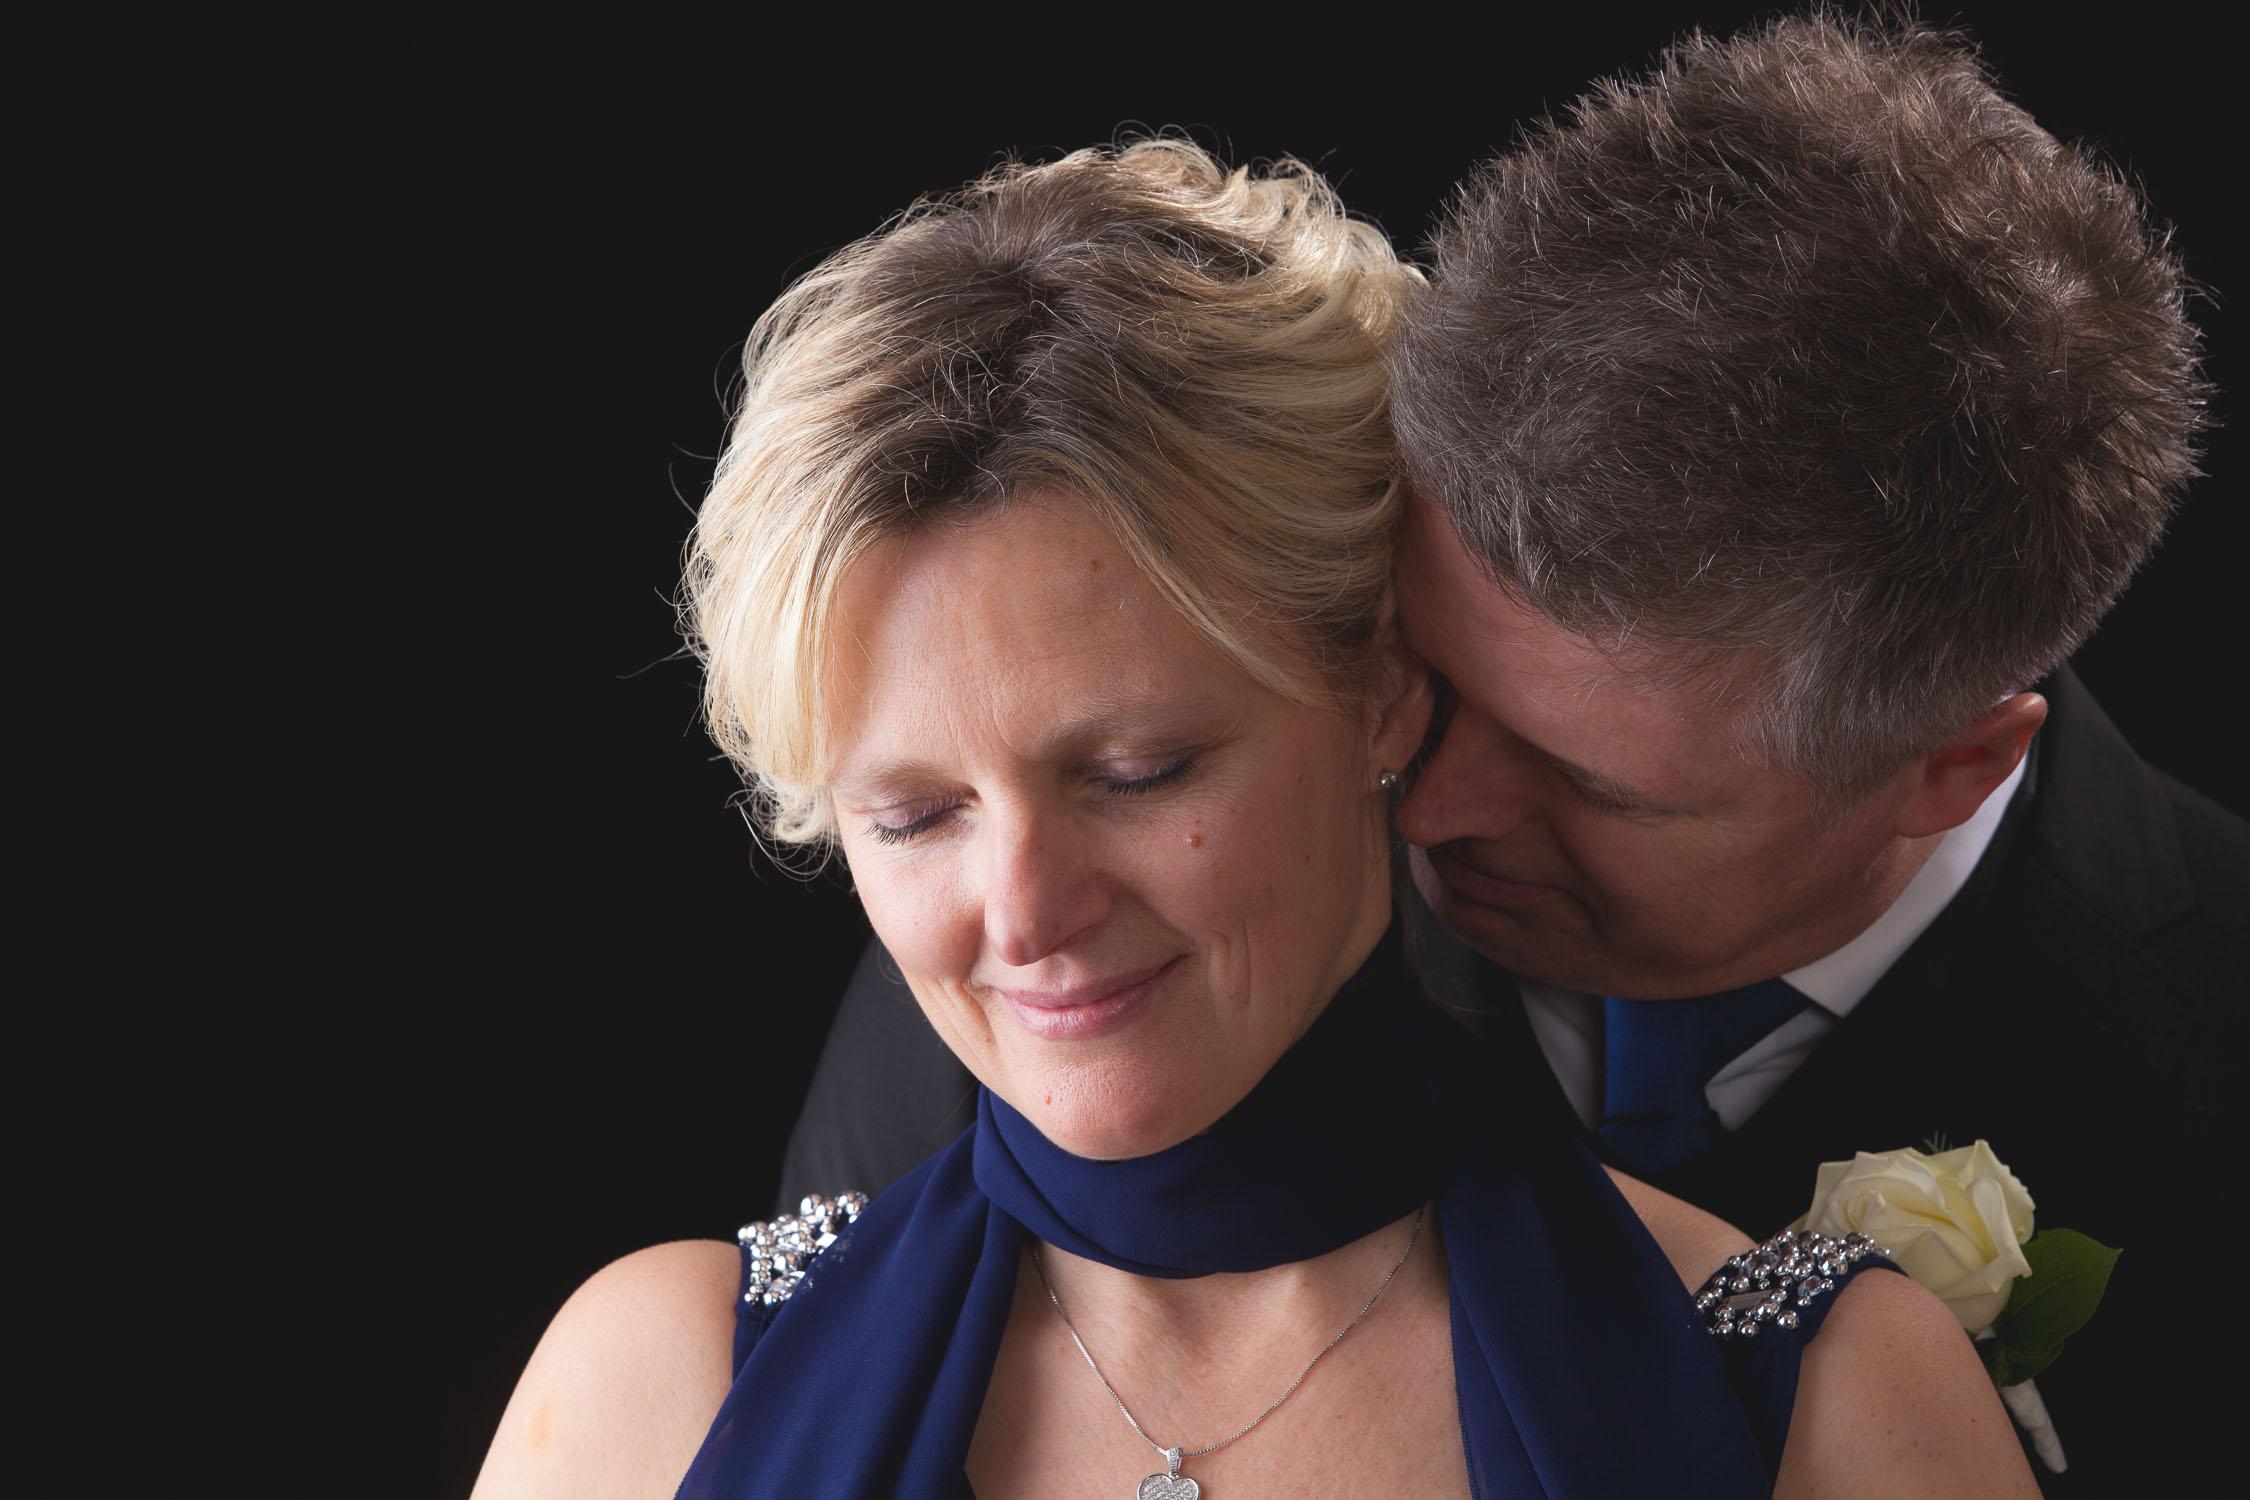 bryllup-bryllupsfotograf-bryllupsfotografering-kjæreste-kjærestefotograf-kjærestefotografering-sarpsborg-hodne-design-pål-hodne-6